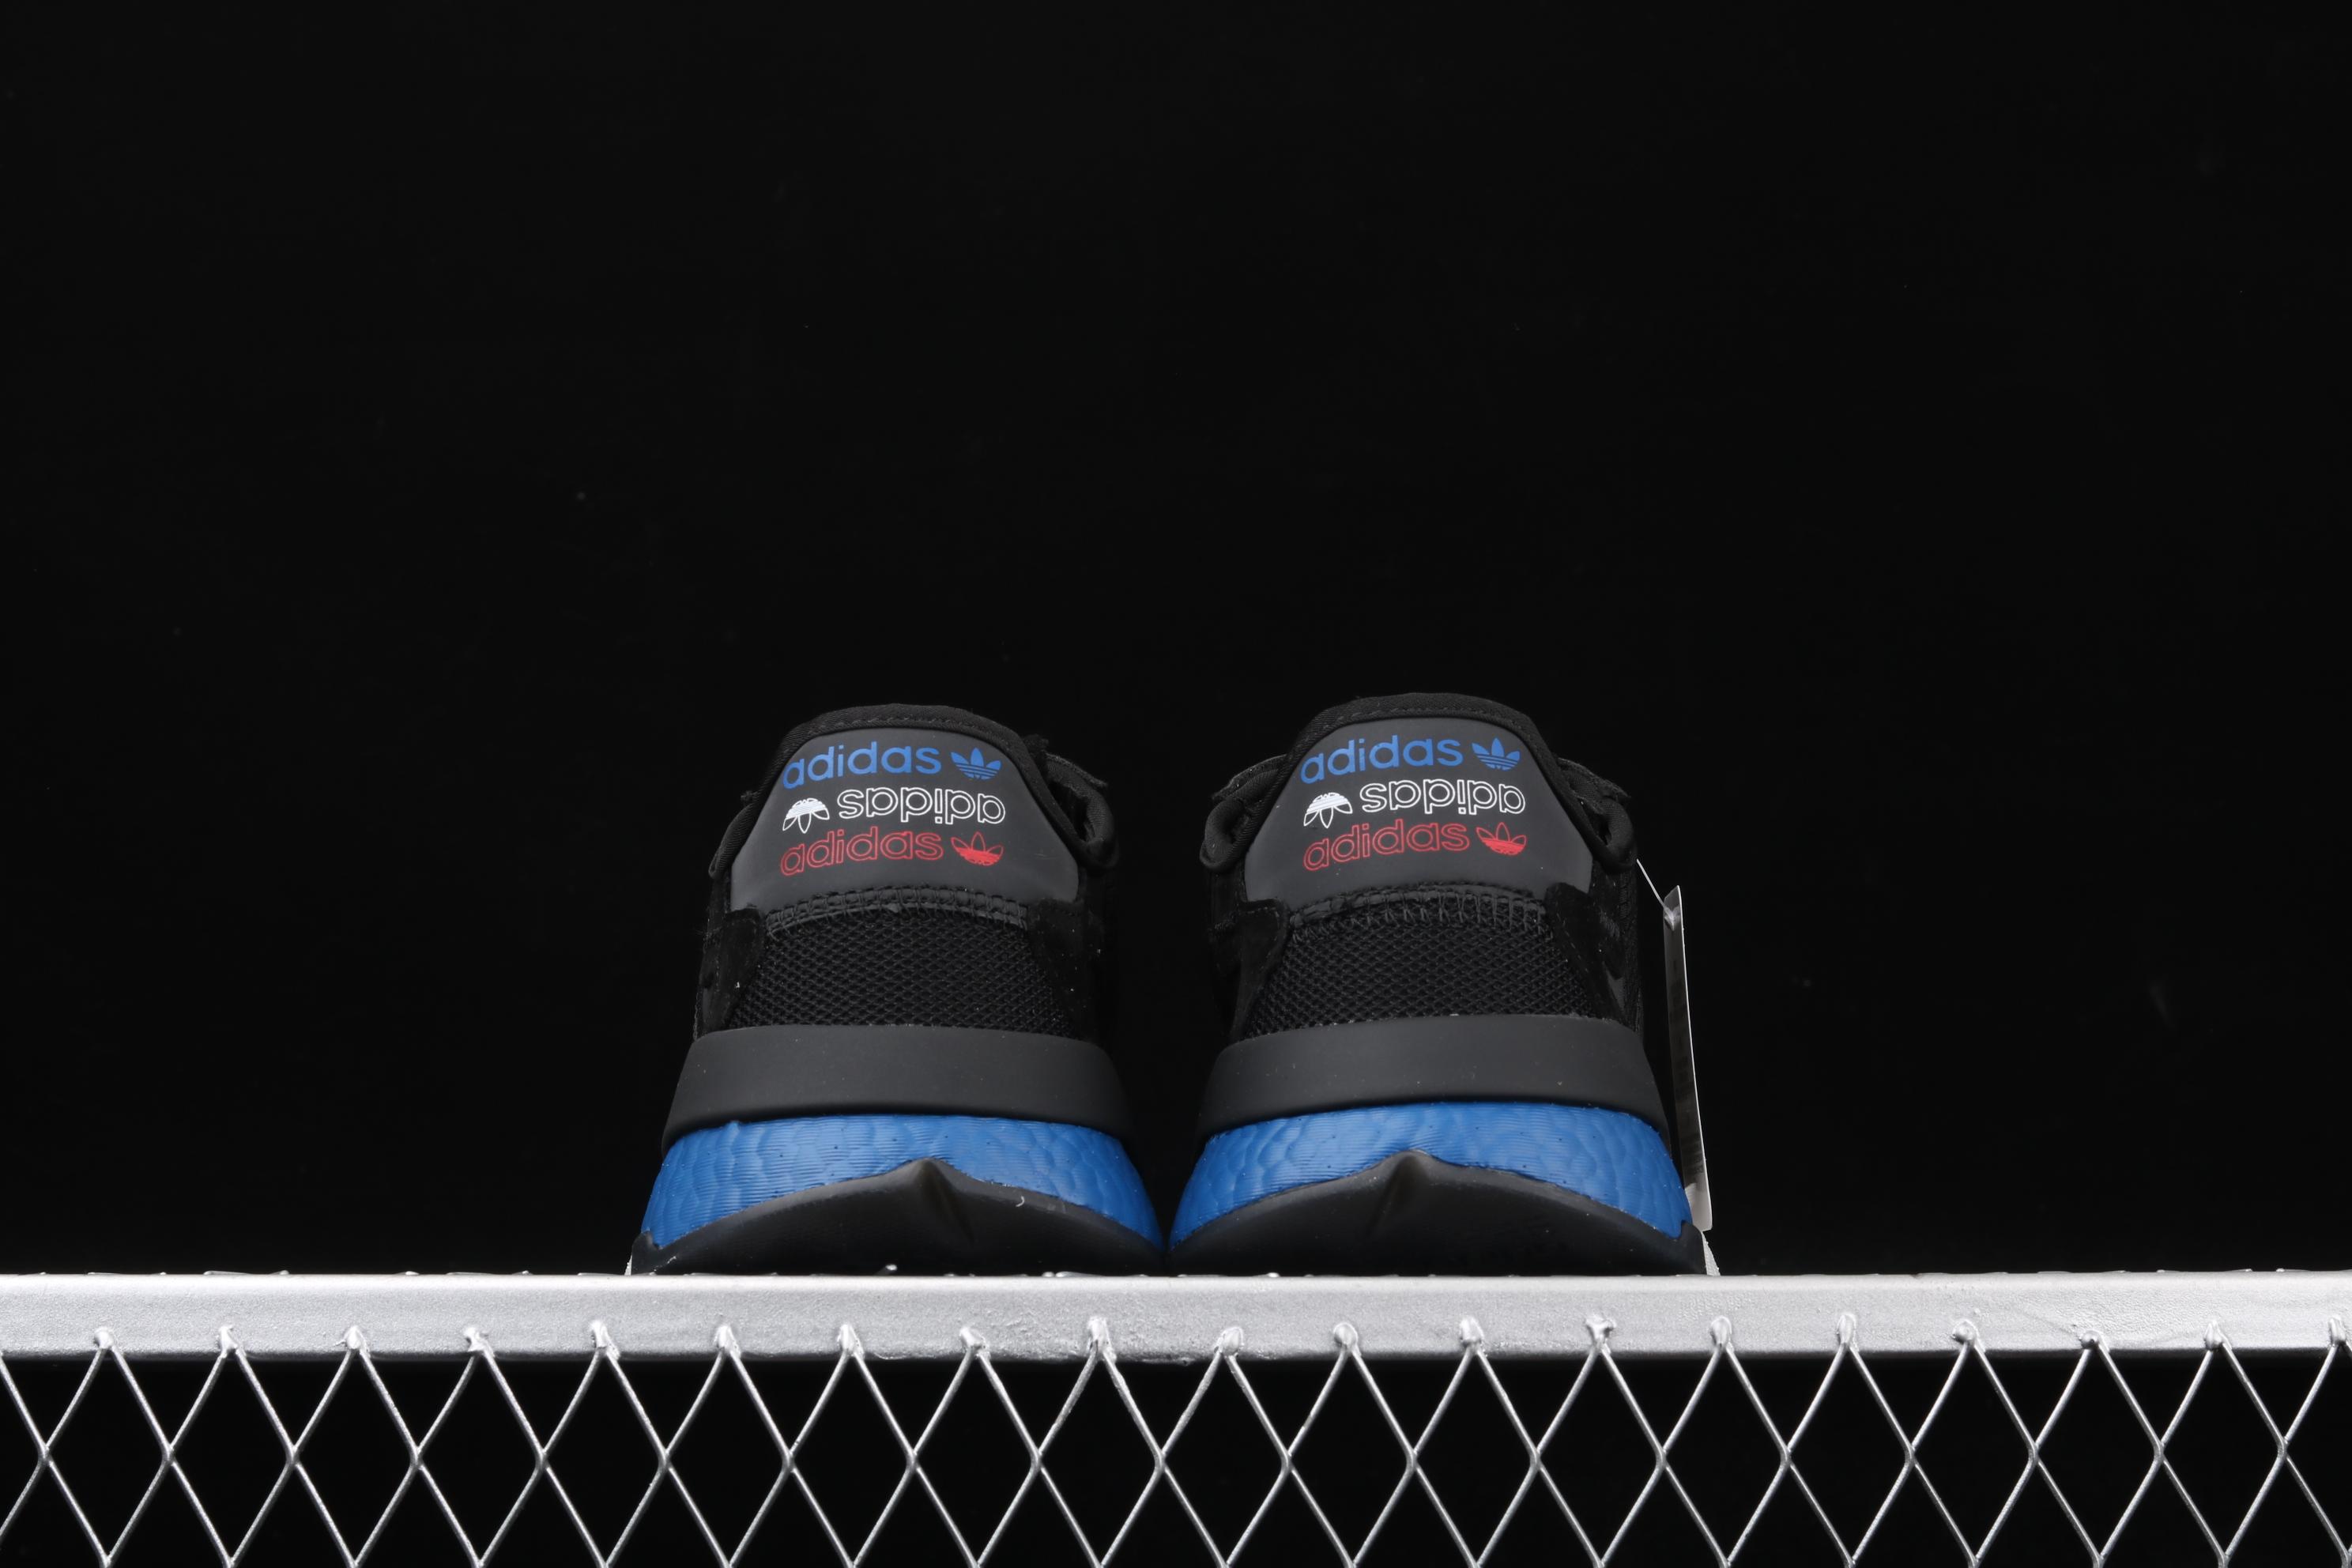 Ad Nite Jogger 2019 Boost FW5331 3M反光复古跑鞋